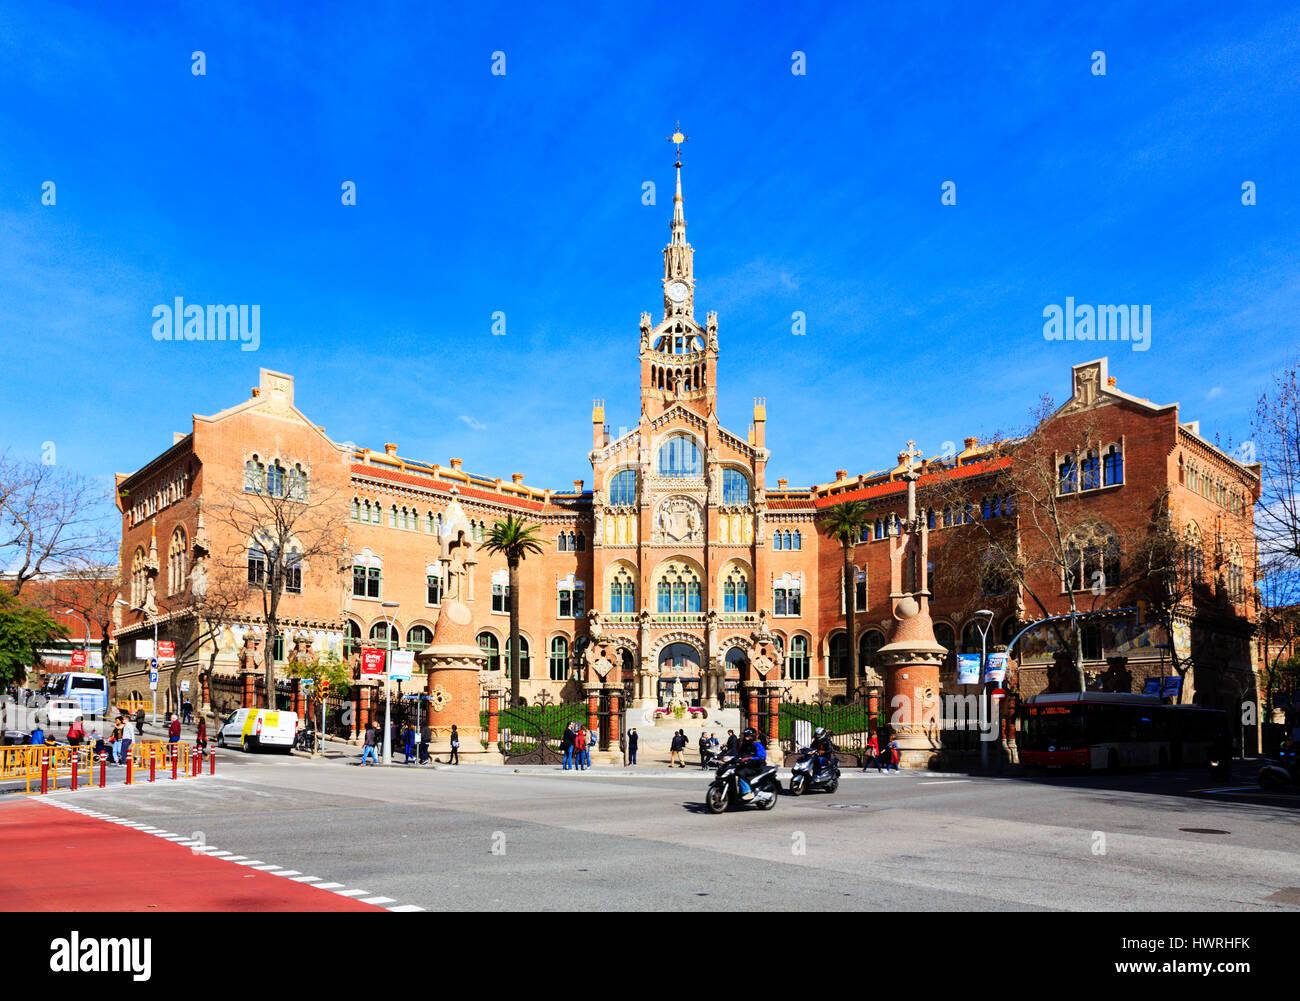 The old Hospital de la Santa Creu i Sant Pau, now the exhibition centre and gallery, Recinte Modernista de Sant - Stock Image